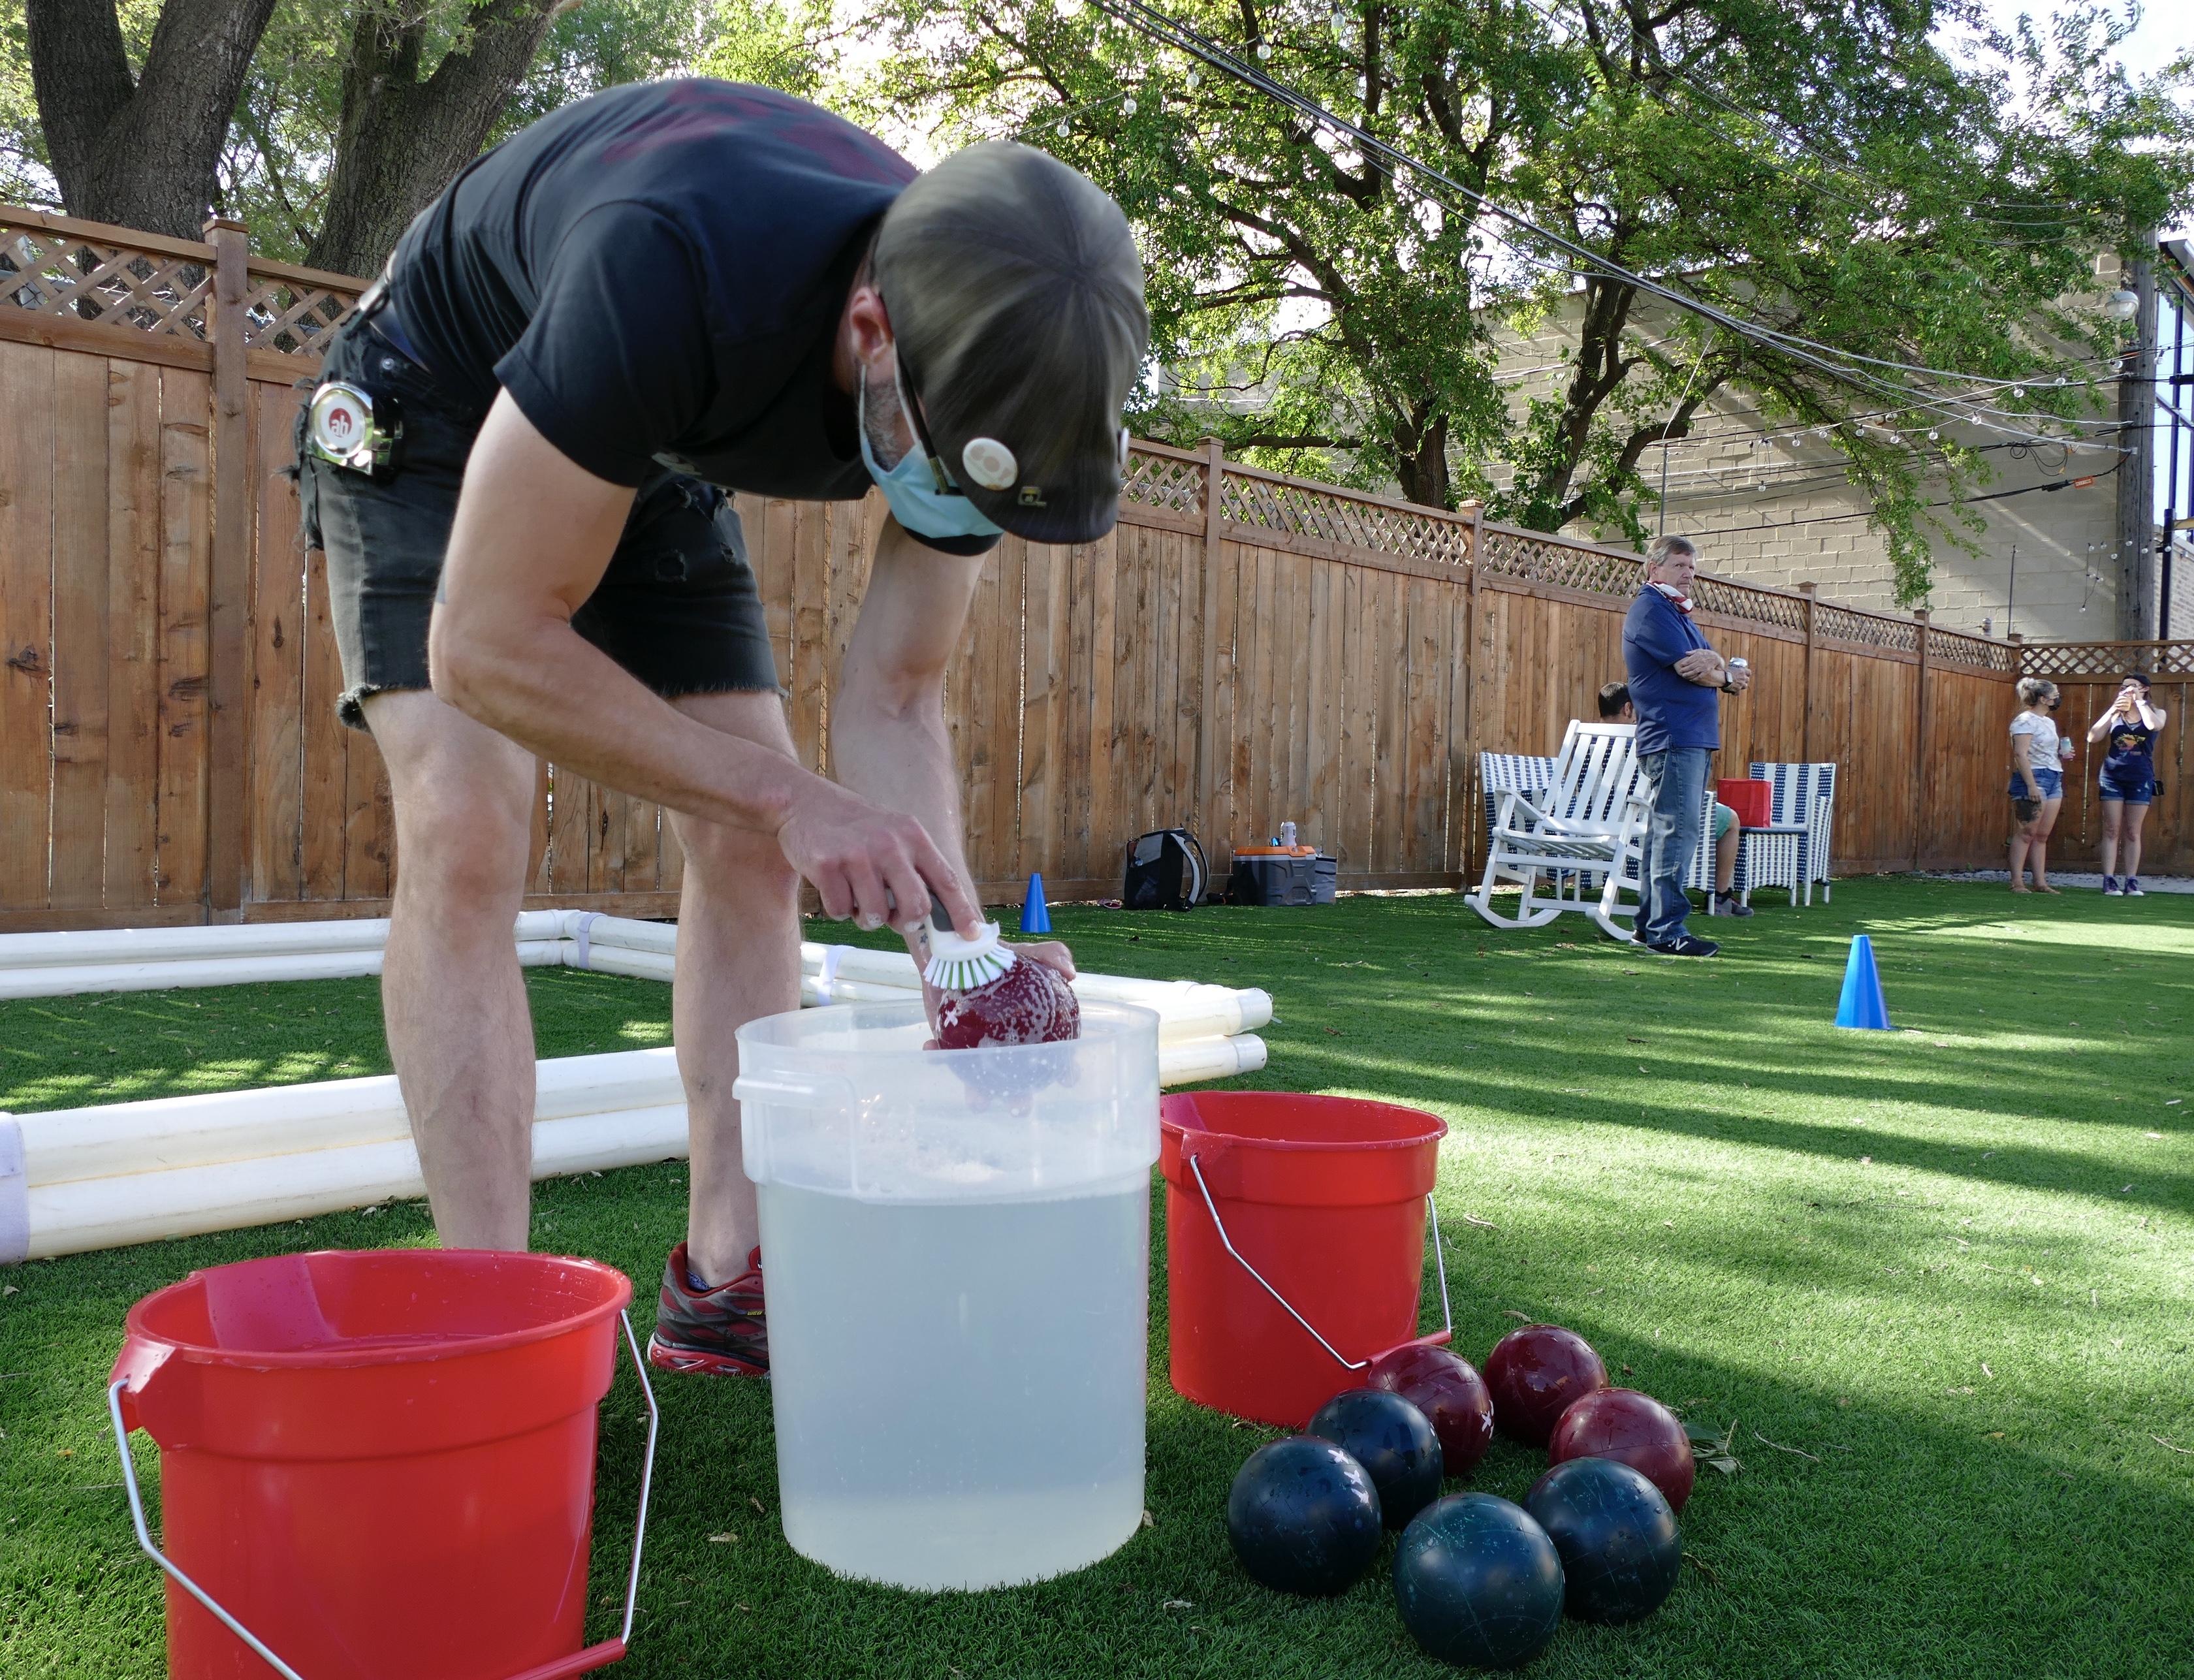 man washes bocce balls during pandemic